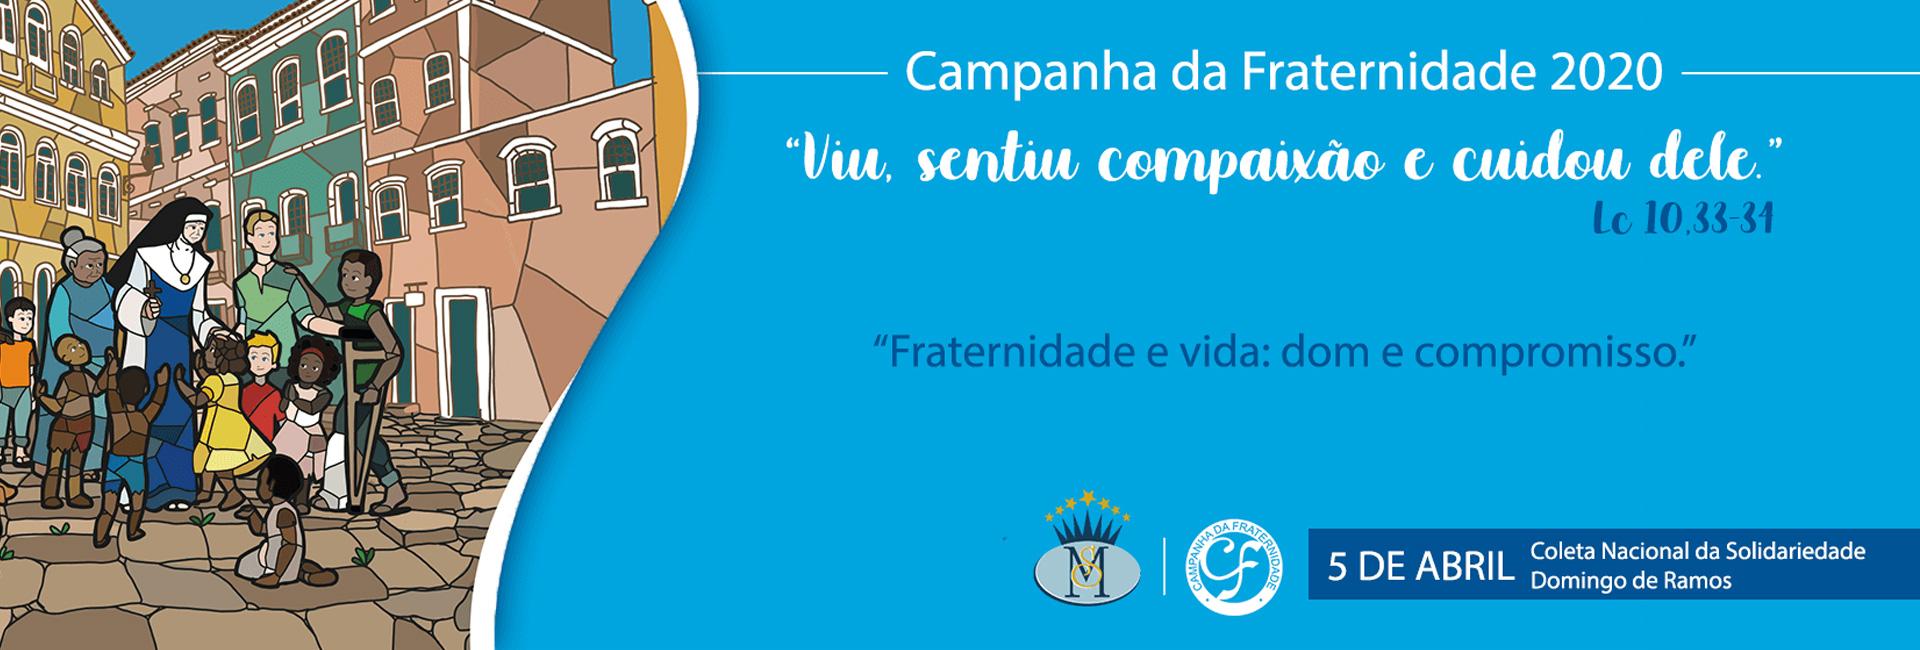 servita-fpss-campanha-fraternidade-2020-desktop-2